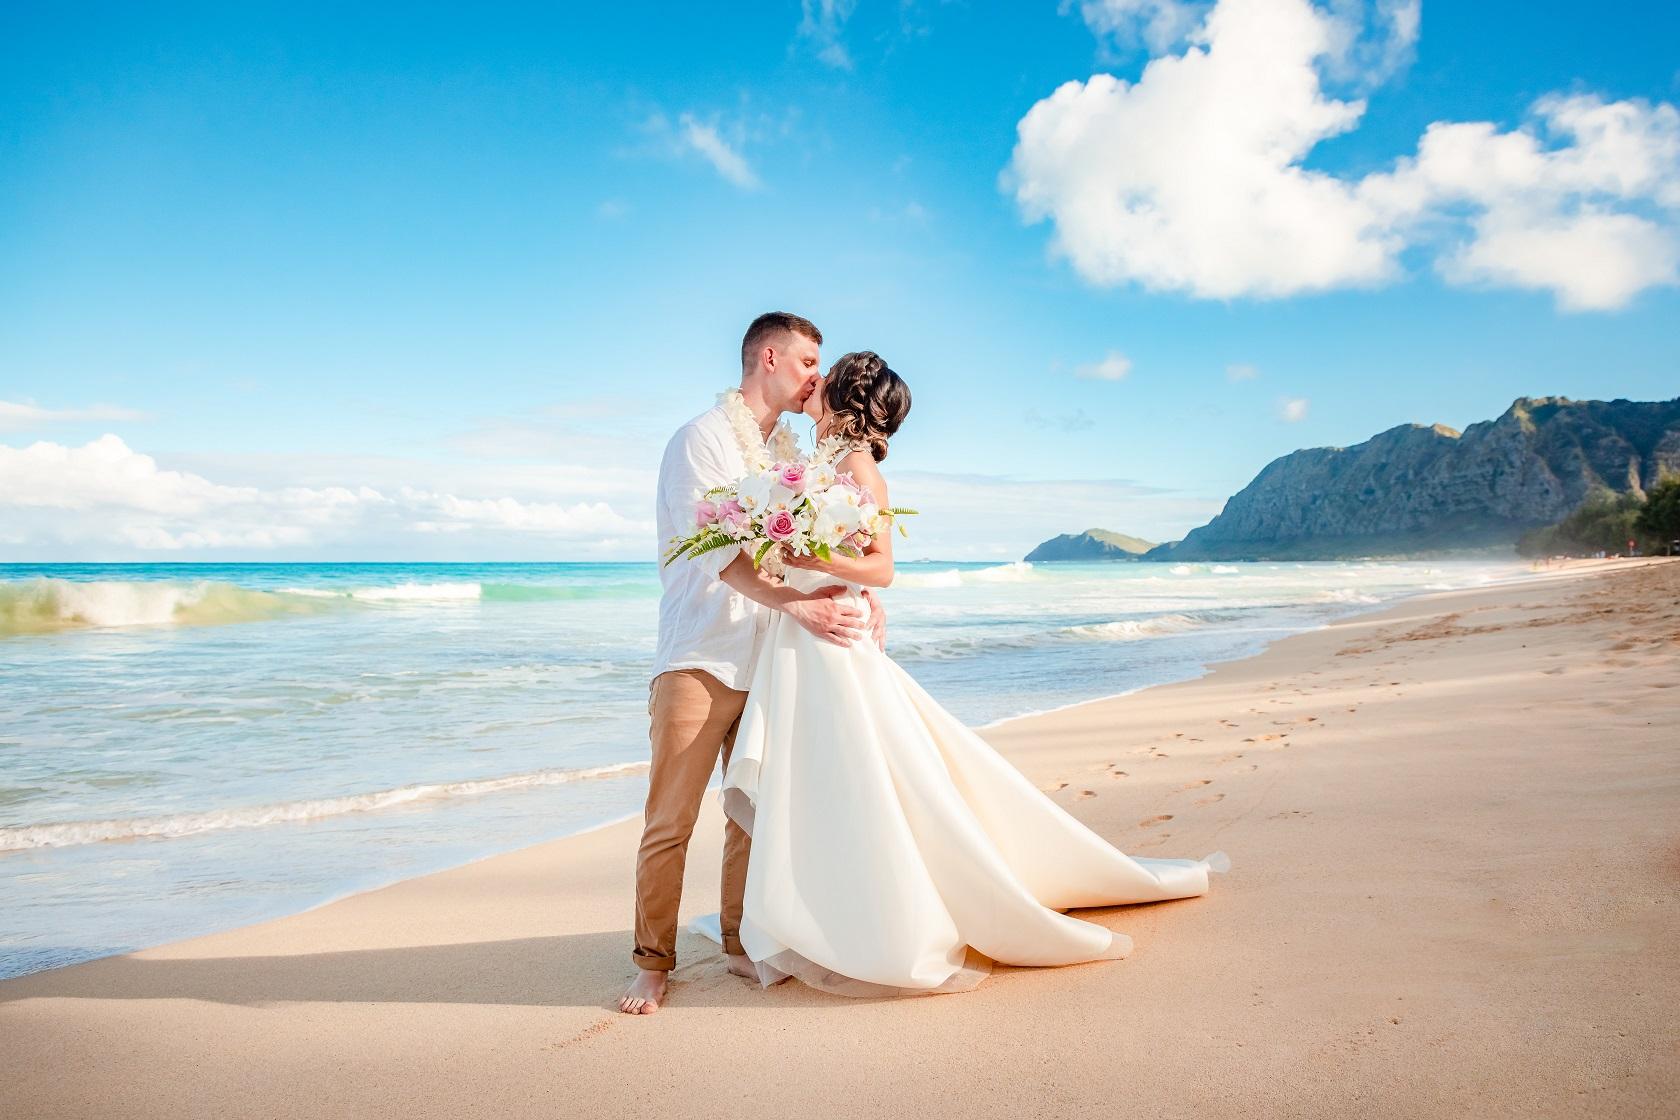 bride groom wedding portrait beach oahu waimanalo hawaii